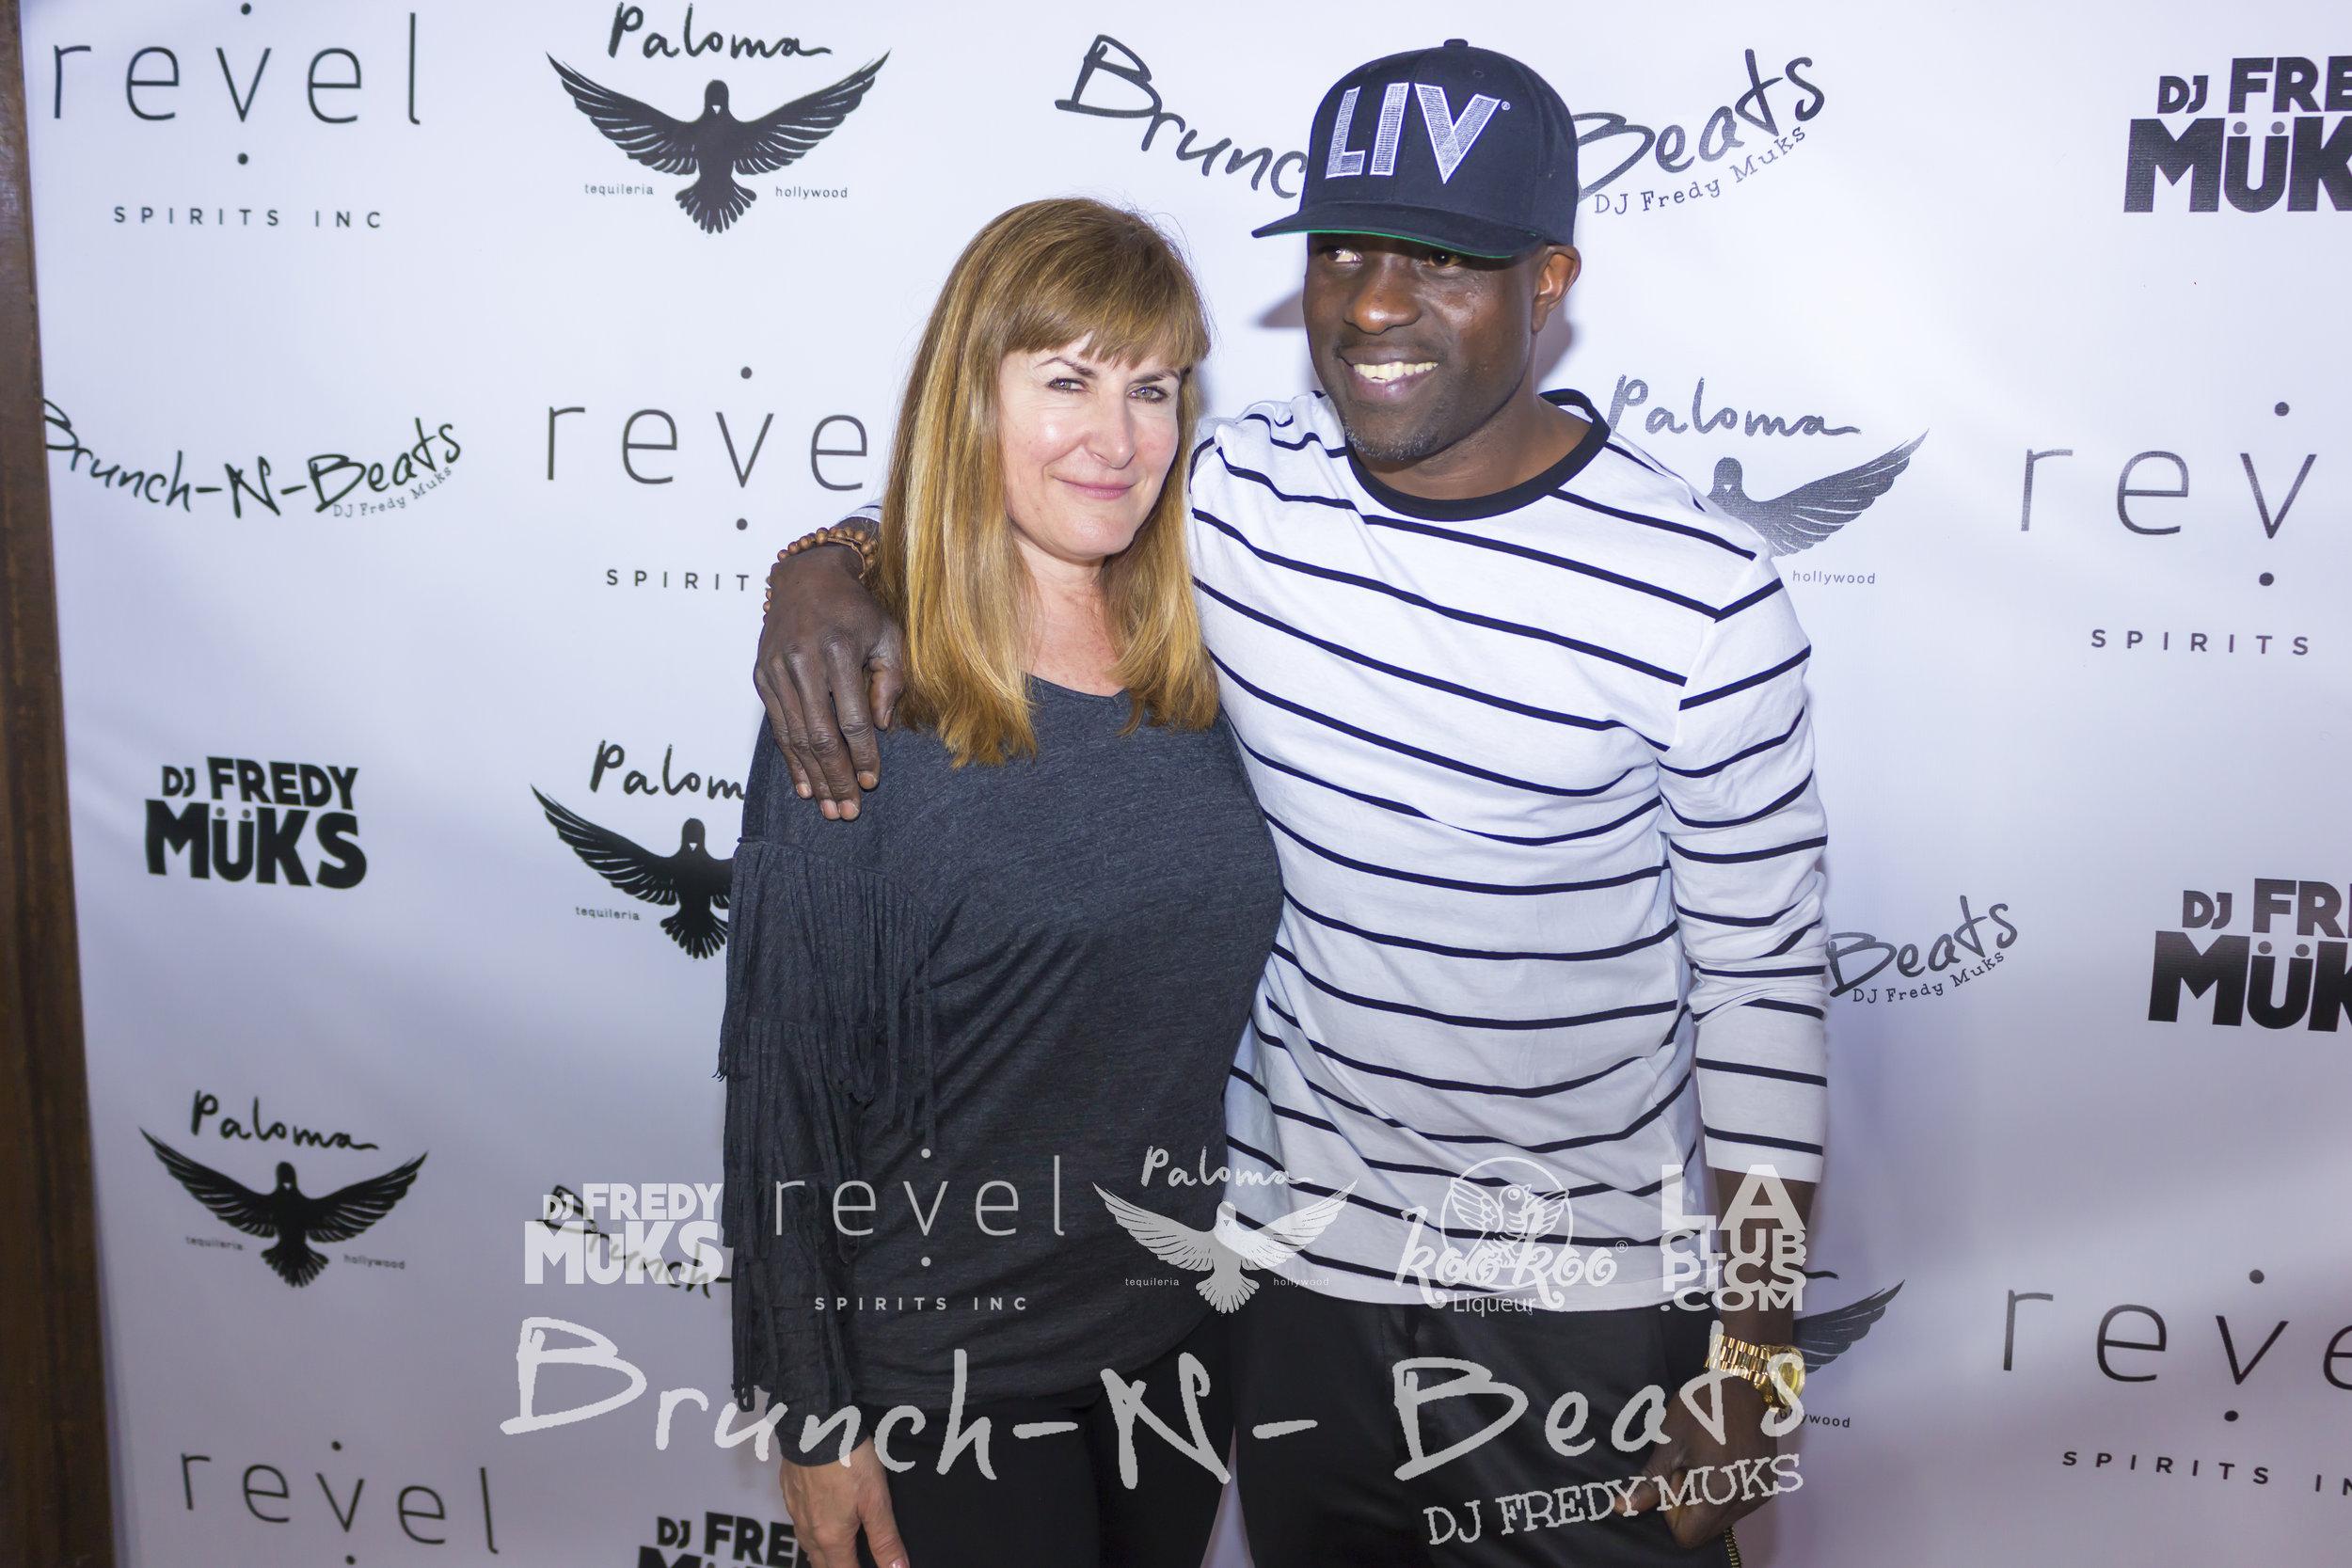 Brunch-N-Beats - Paloma Hollywood - 02-25-18_175.jpg